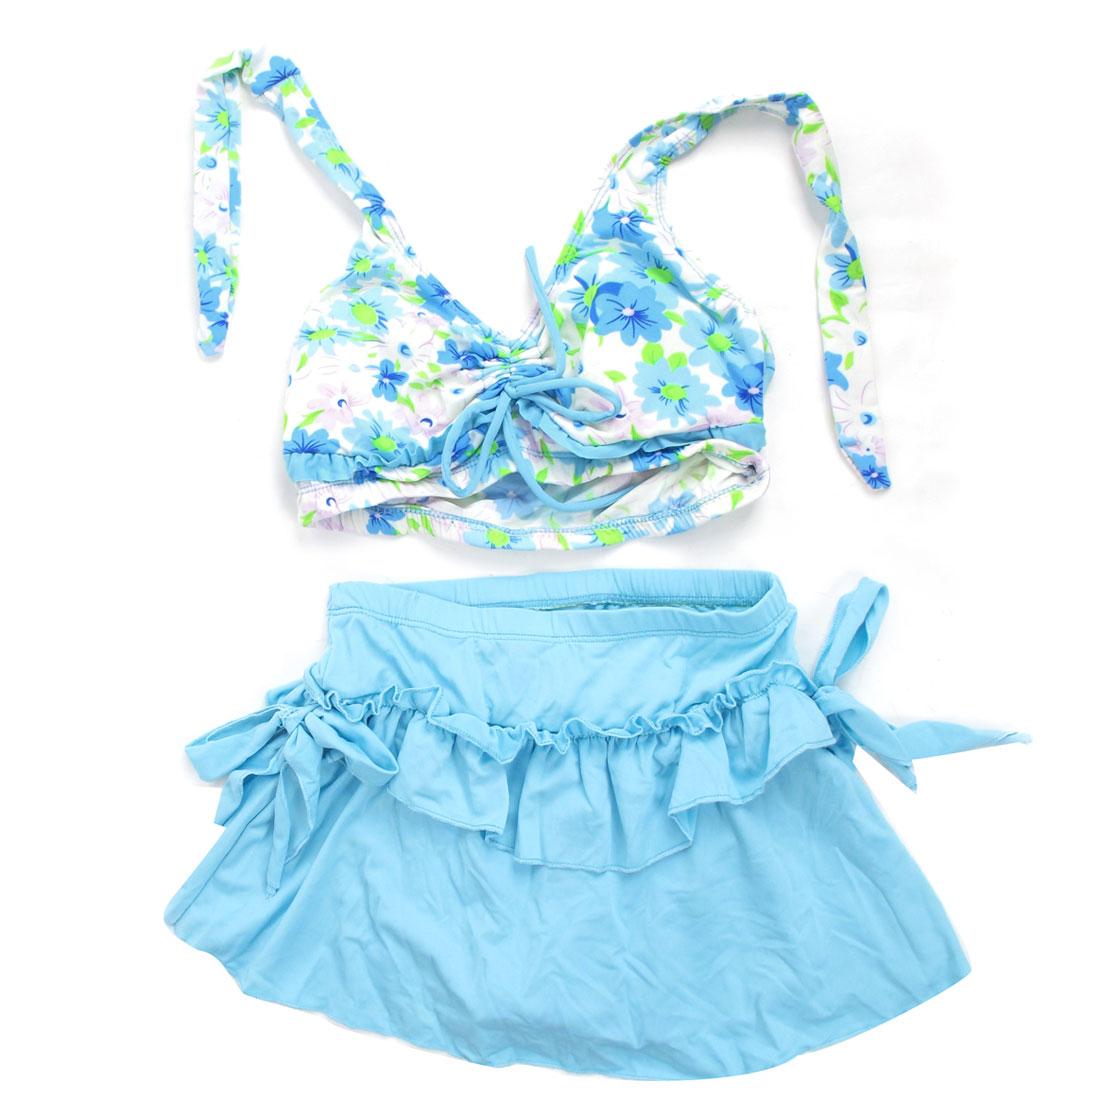 Woman Beachwear Flower Print Halter Neck Bra Top Skirt Swimsuit Swimwear Cyan XS